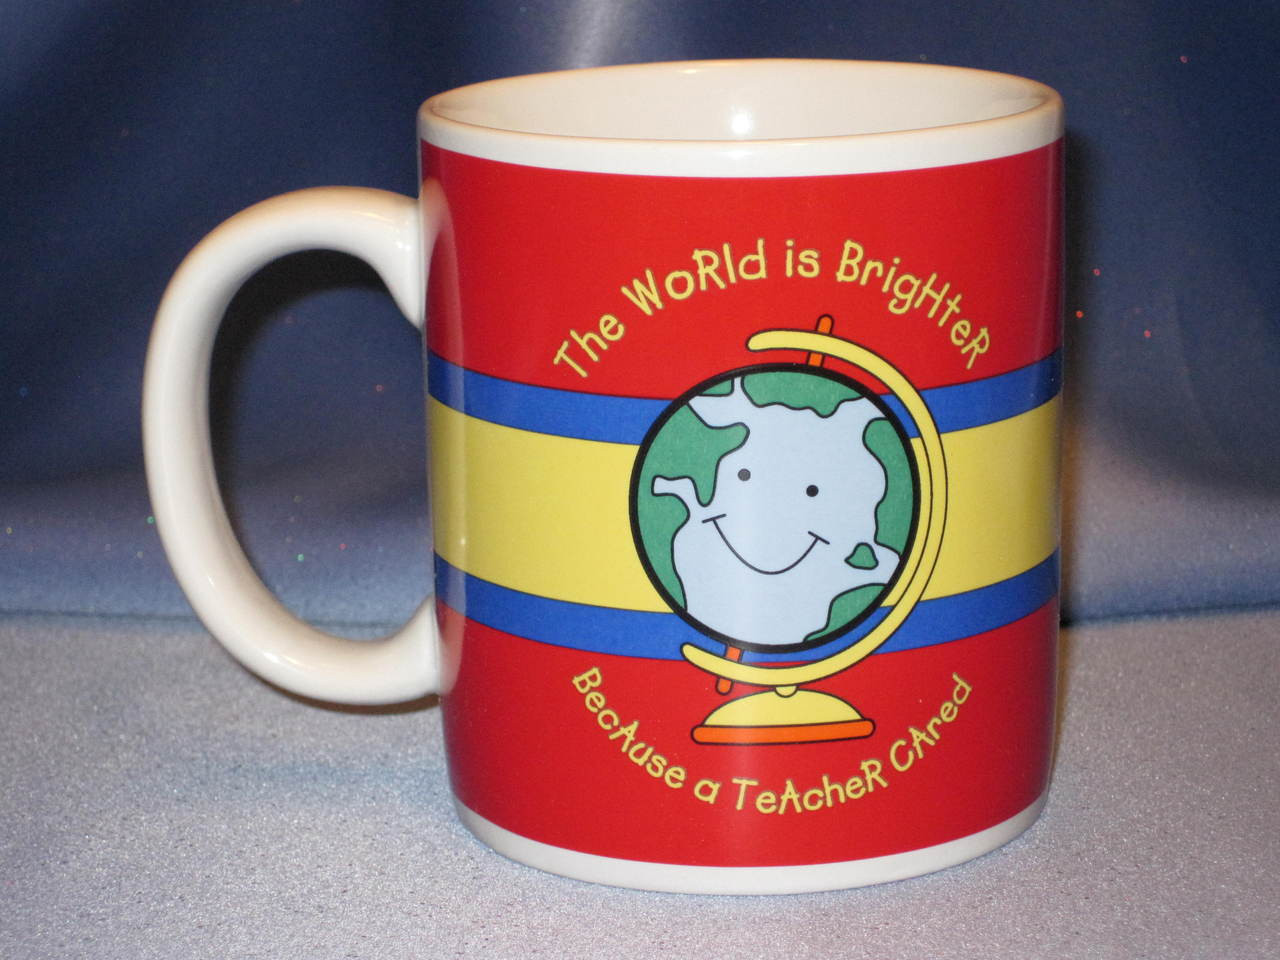 Little Olde School House - Teacher Appreciation Mug.